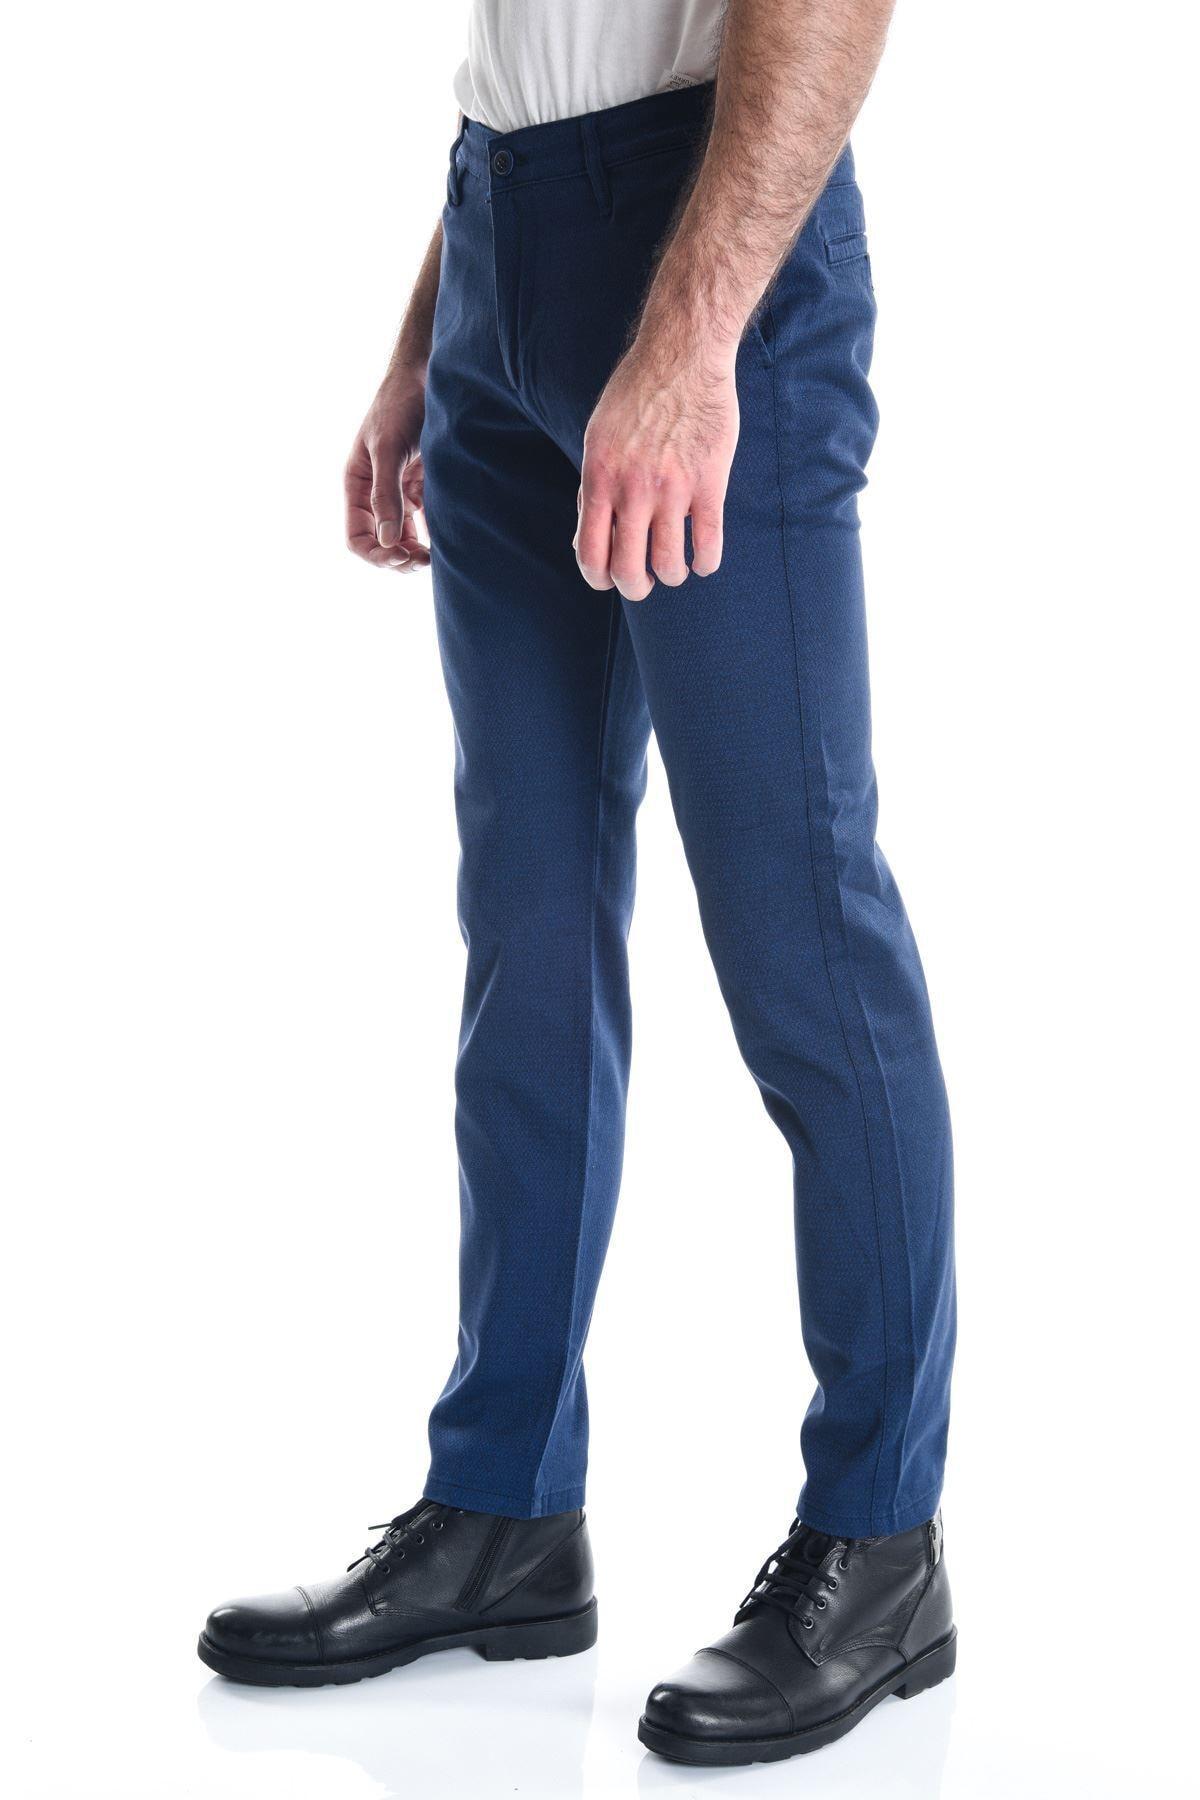 LTC Jeans Lacivert Desenli Armürlü Chino Erkek Pantolon 2